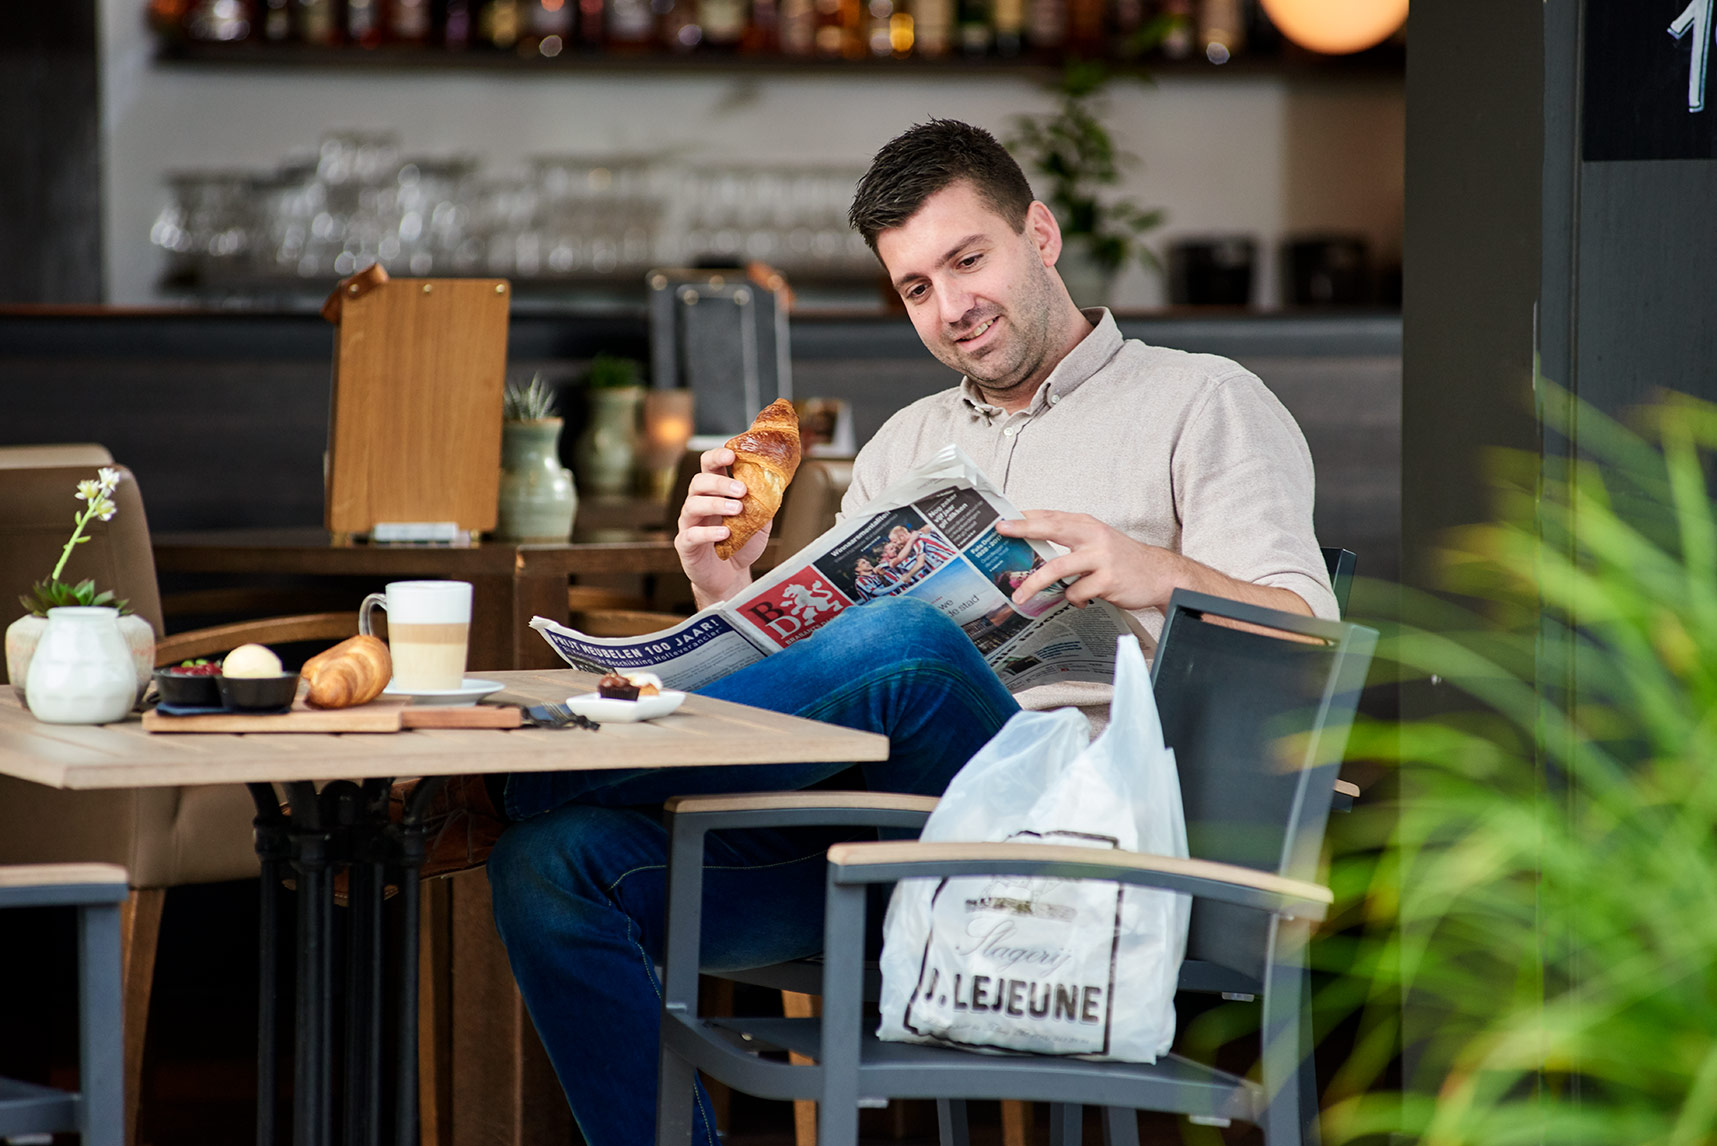 Grand-café-puur-Mercure-hotel-tilburg-centrum